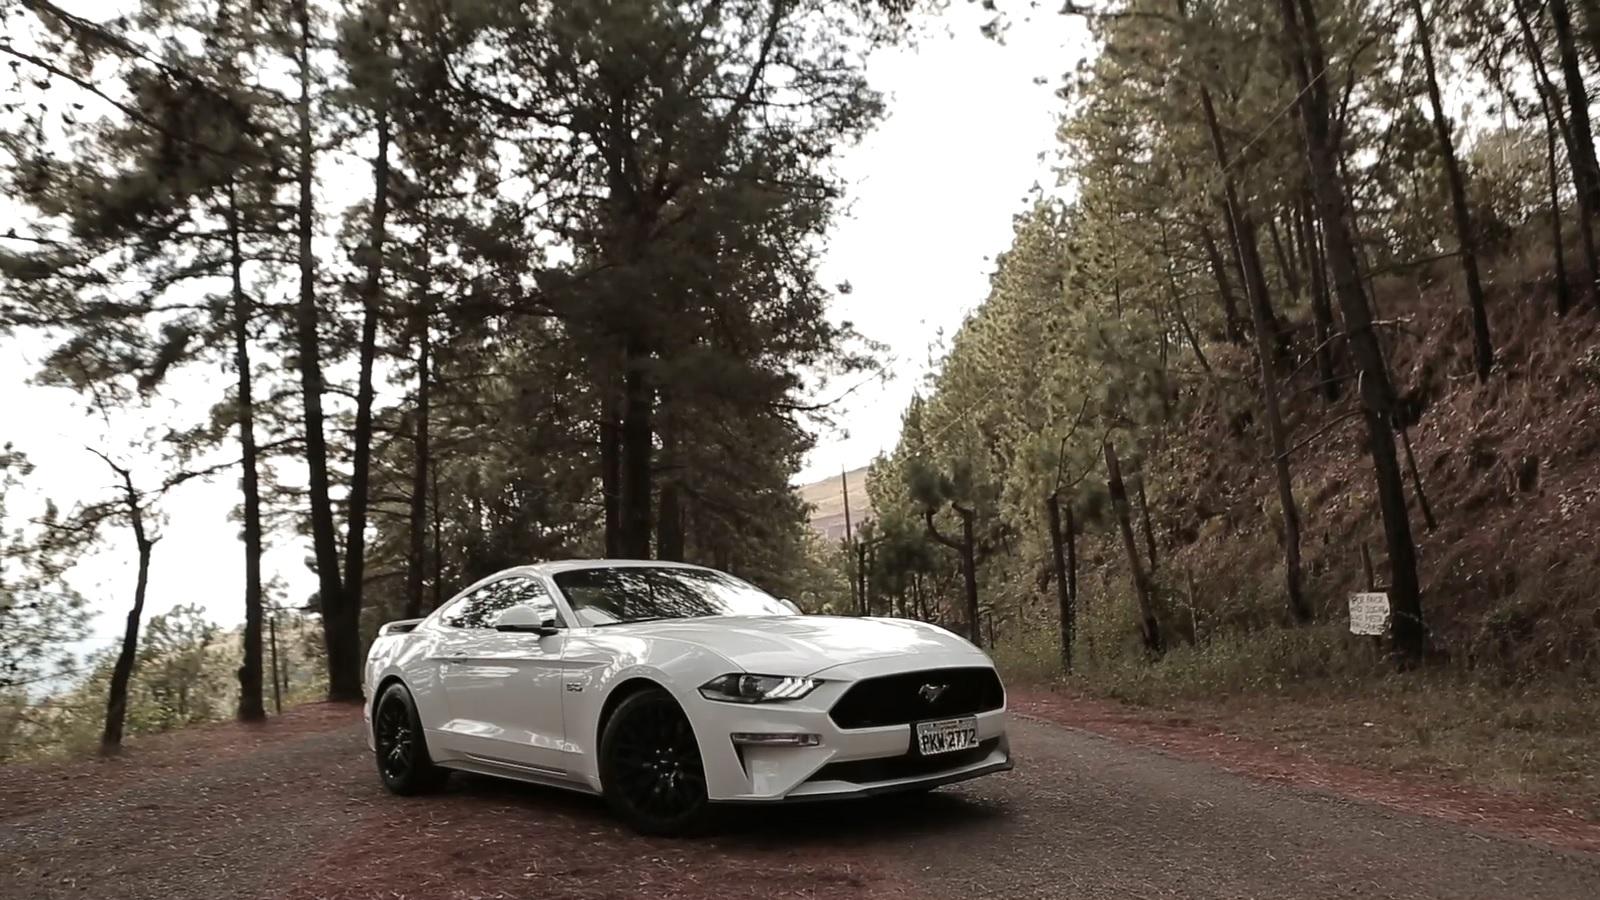 Ford Mustang GT é esportivo de quase R$ 300 mil